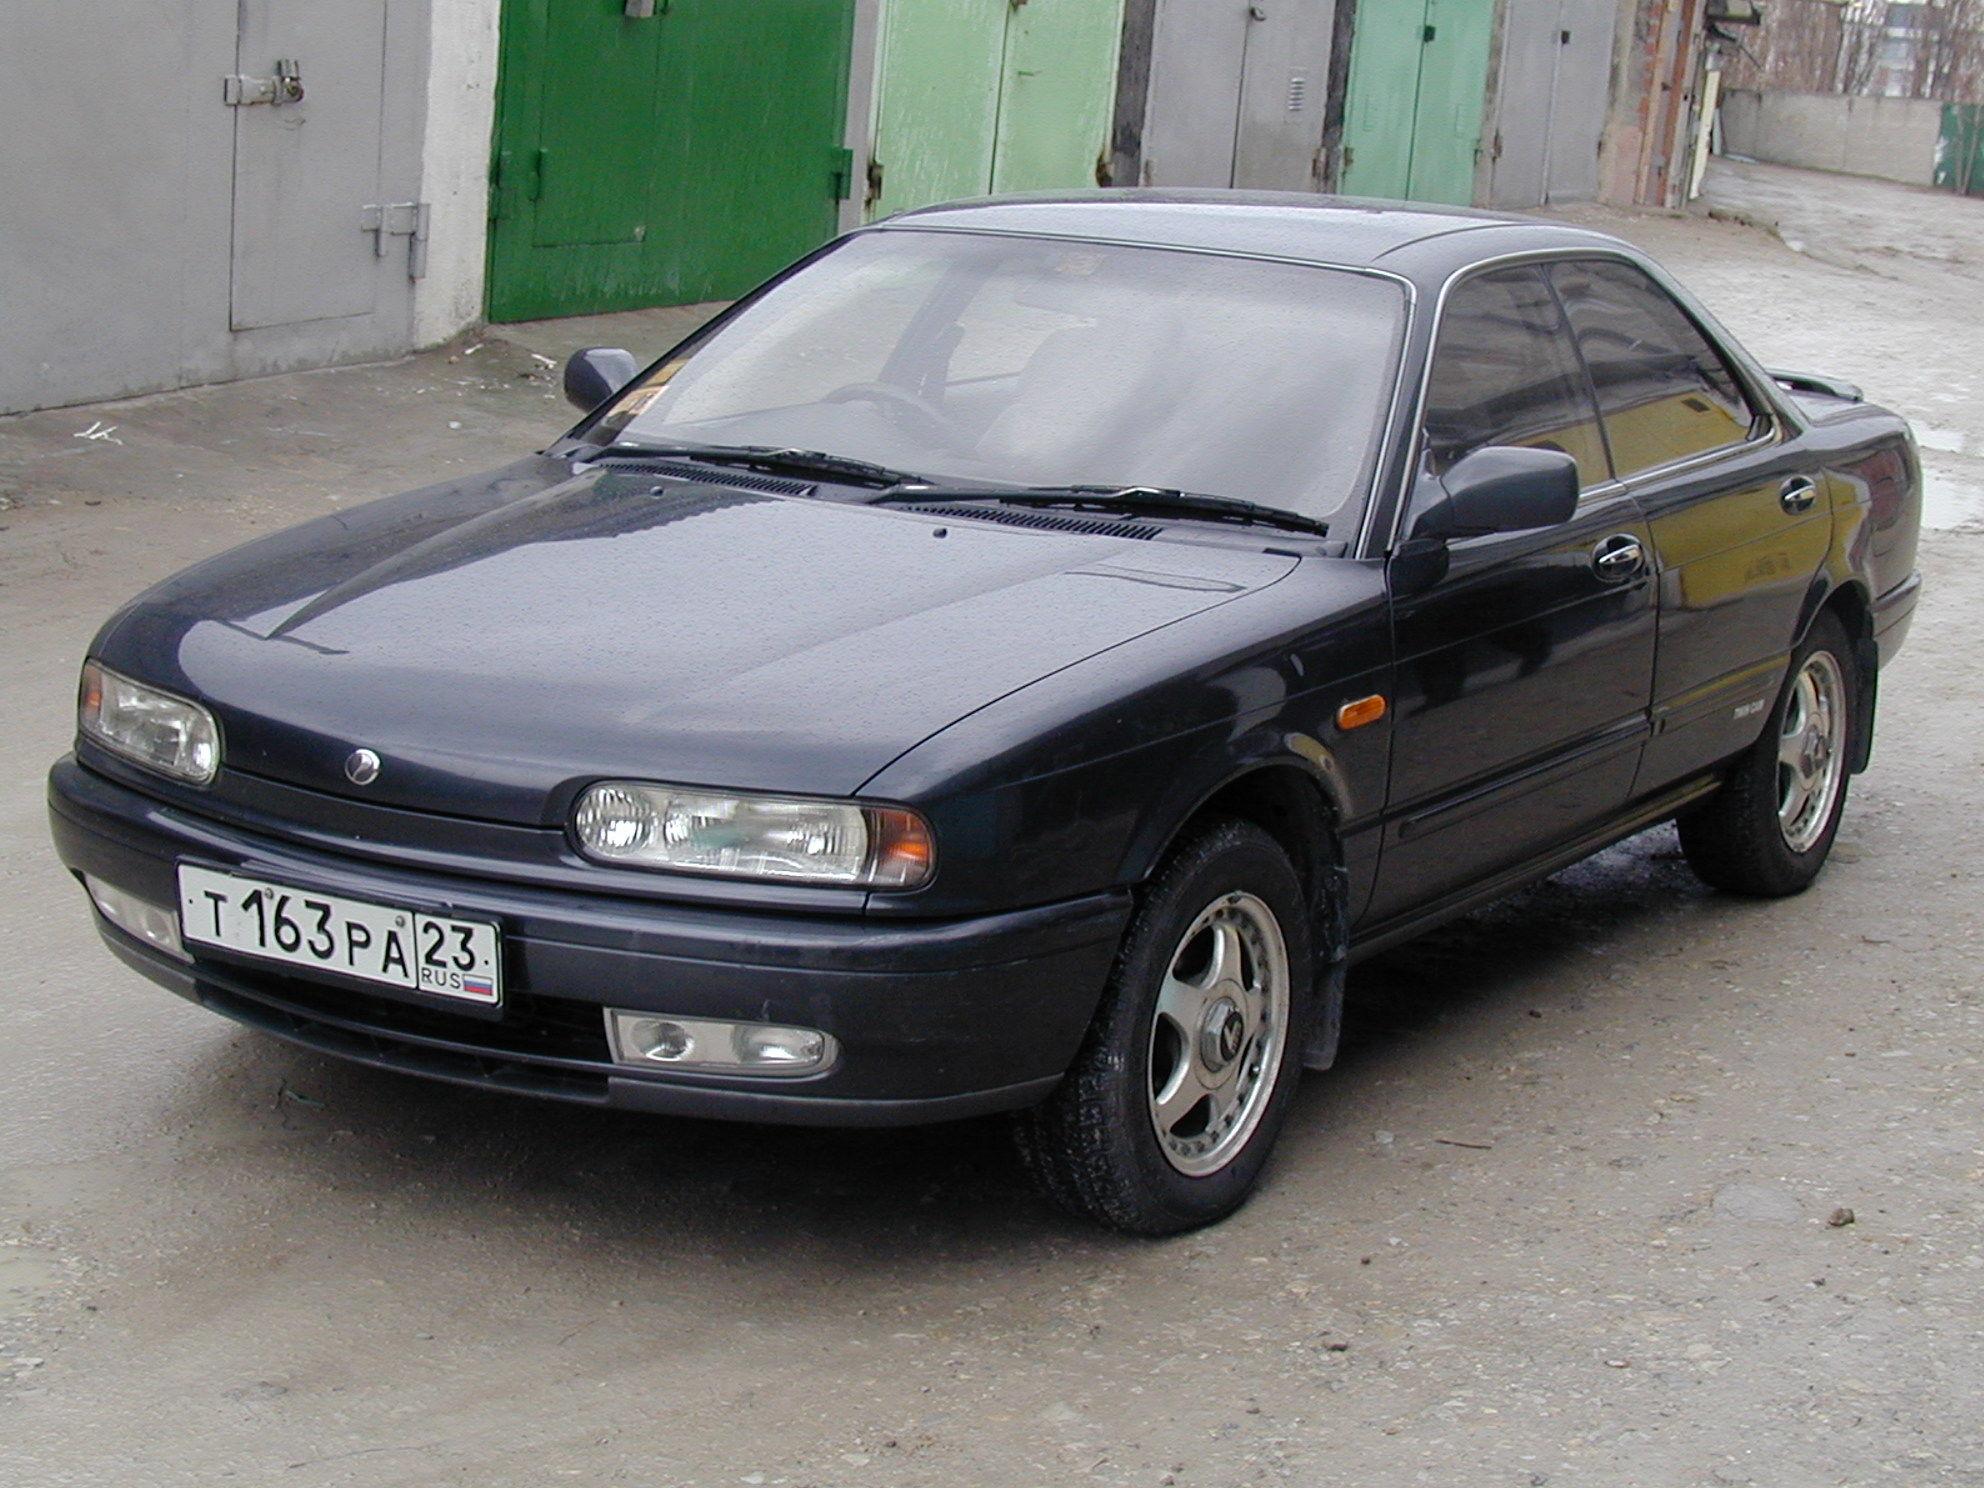 Nissan Presea I 1990 - 1995 Sedan #2